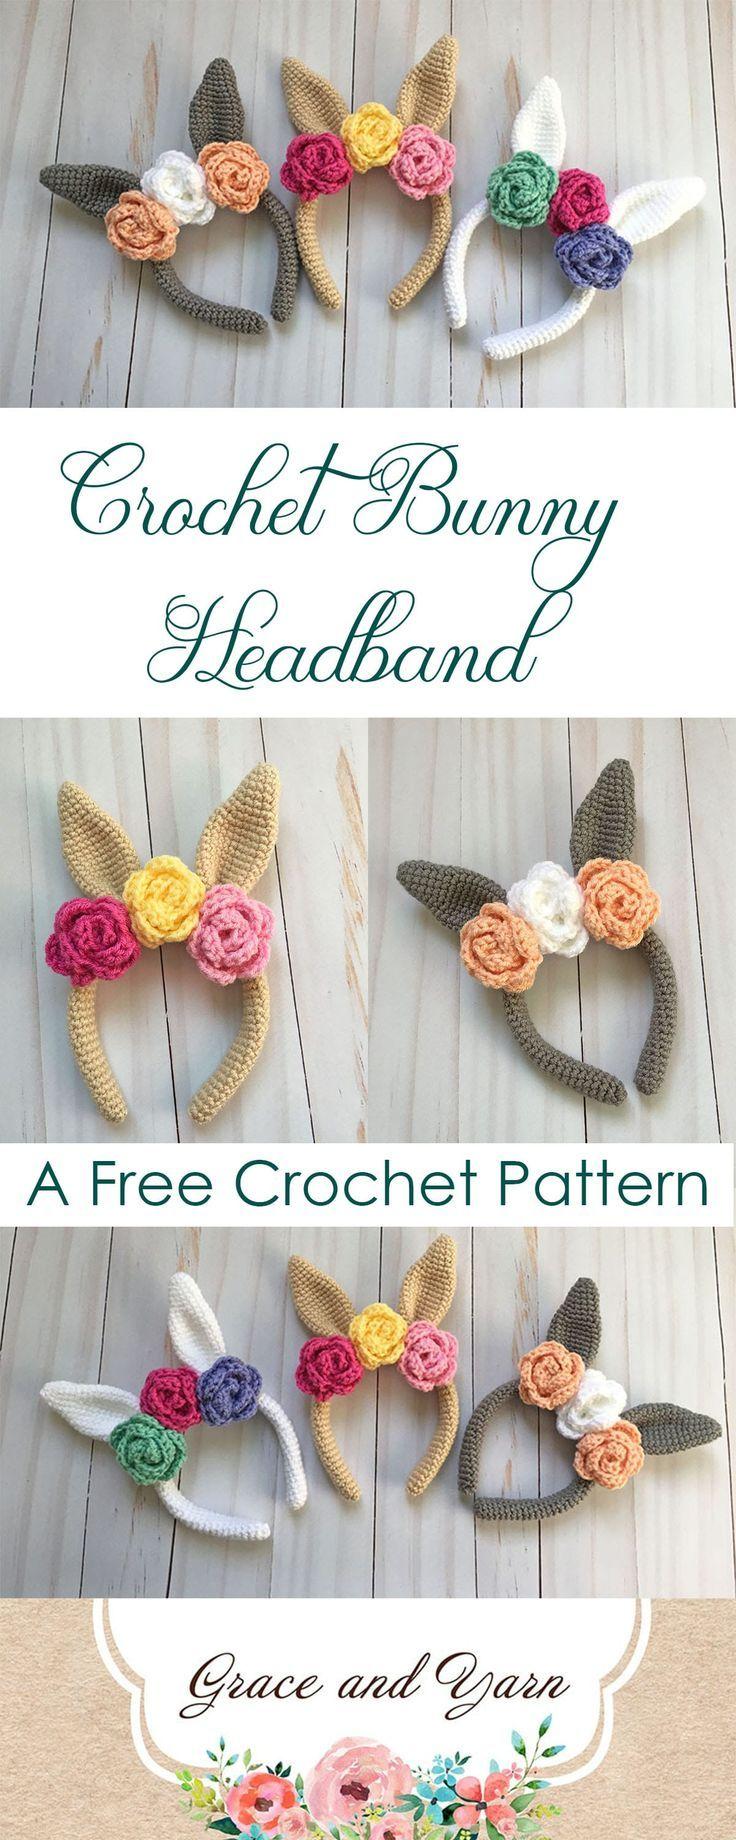 Crochet Bunny Headband - A Free Pattern | Diademas | Pinterest ...